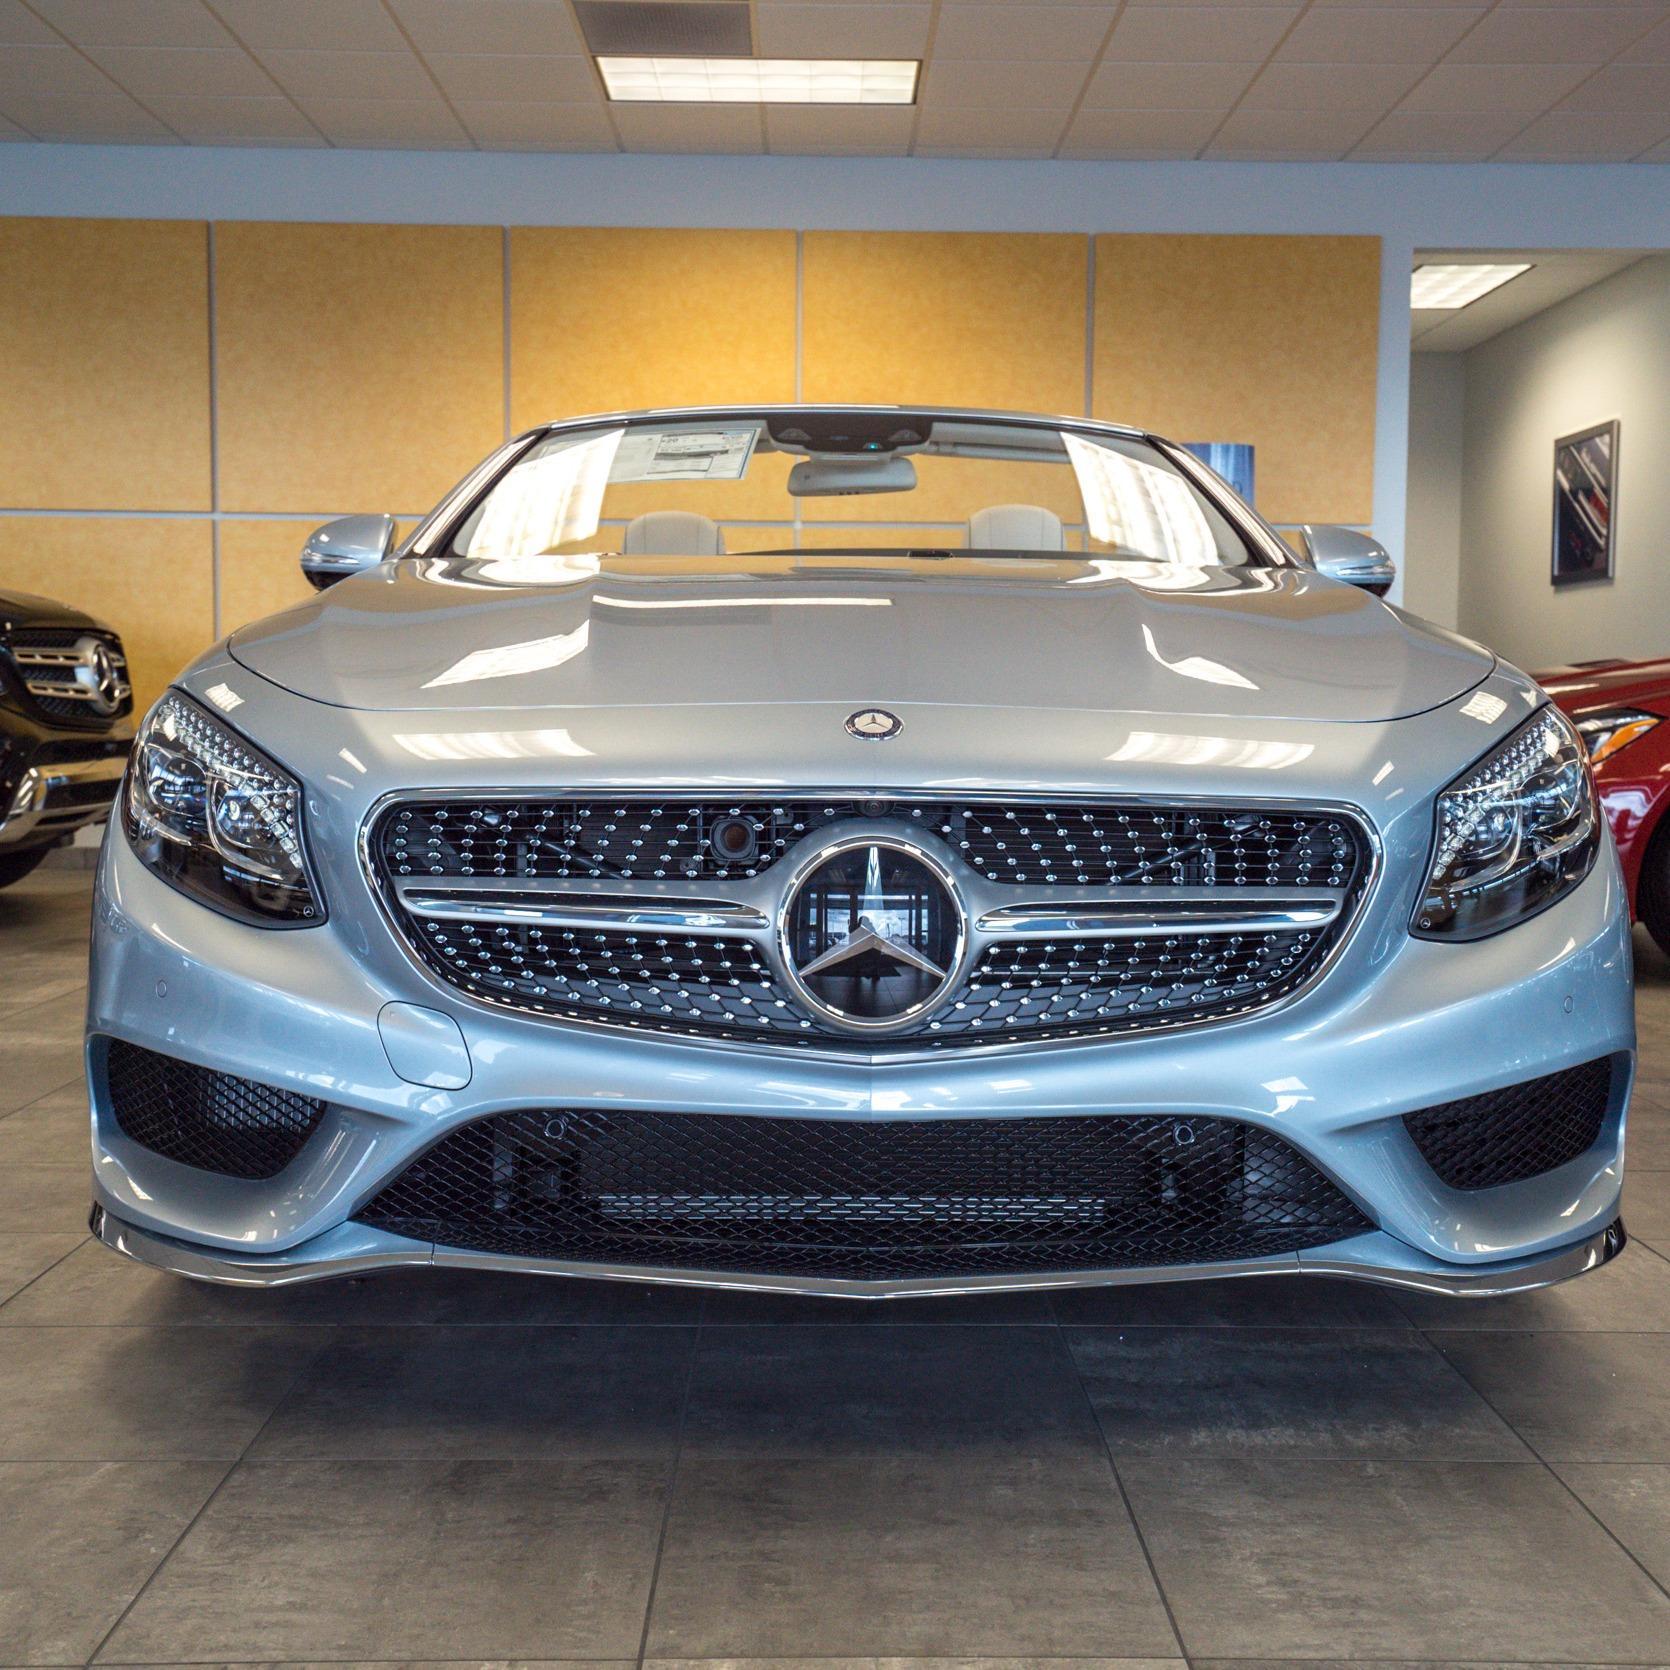 Mercedes-Benz of Waco